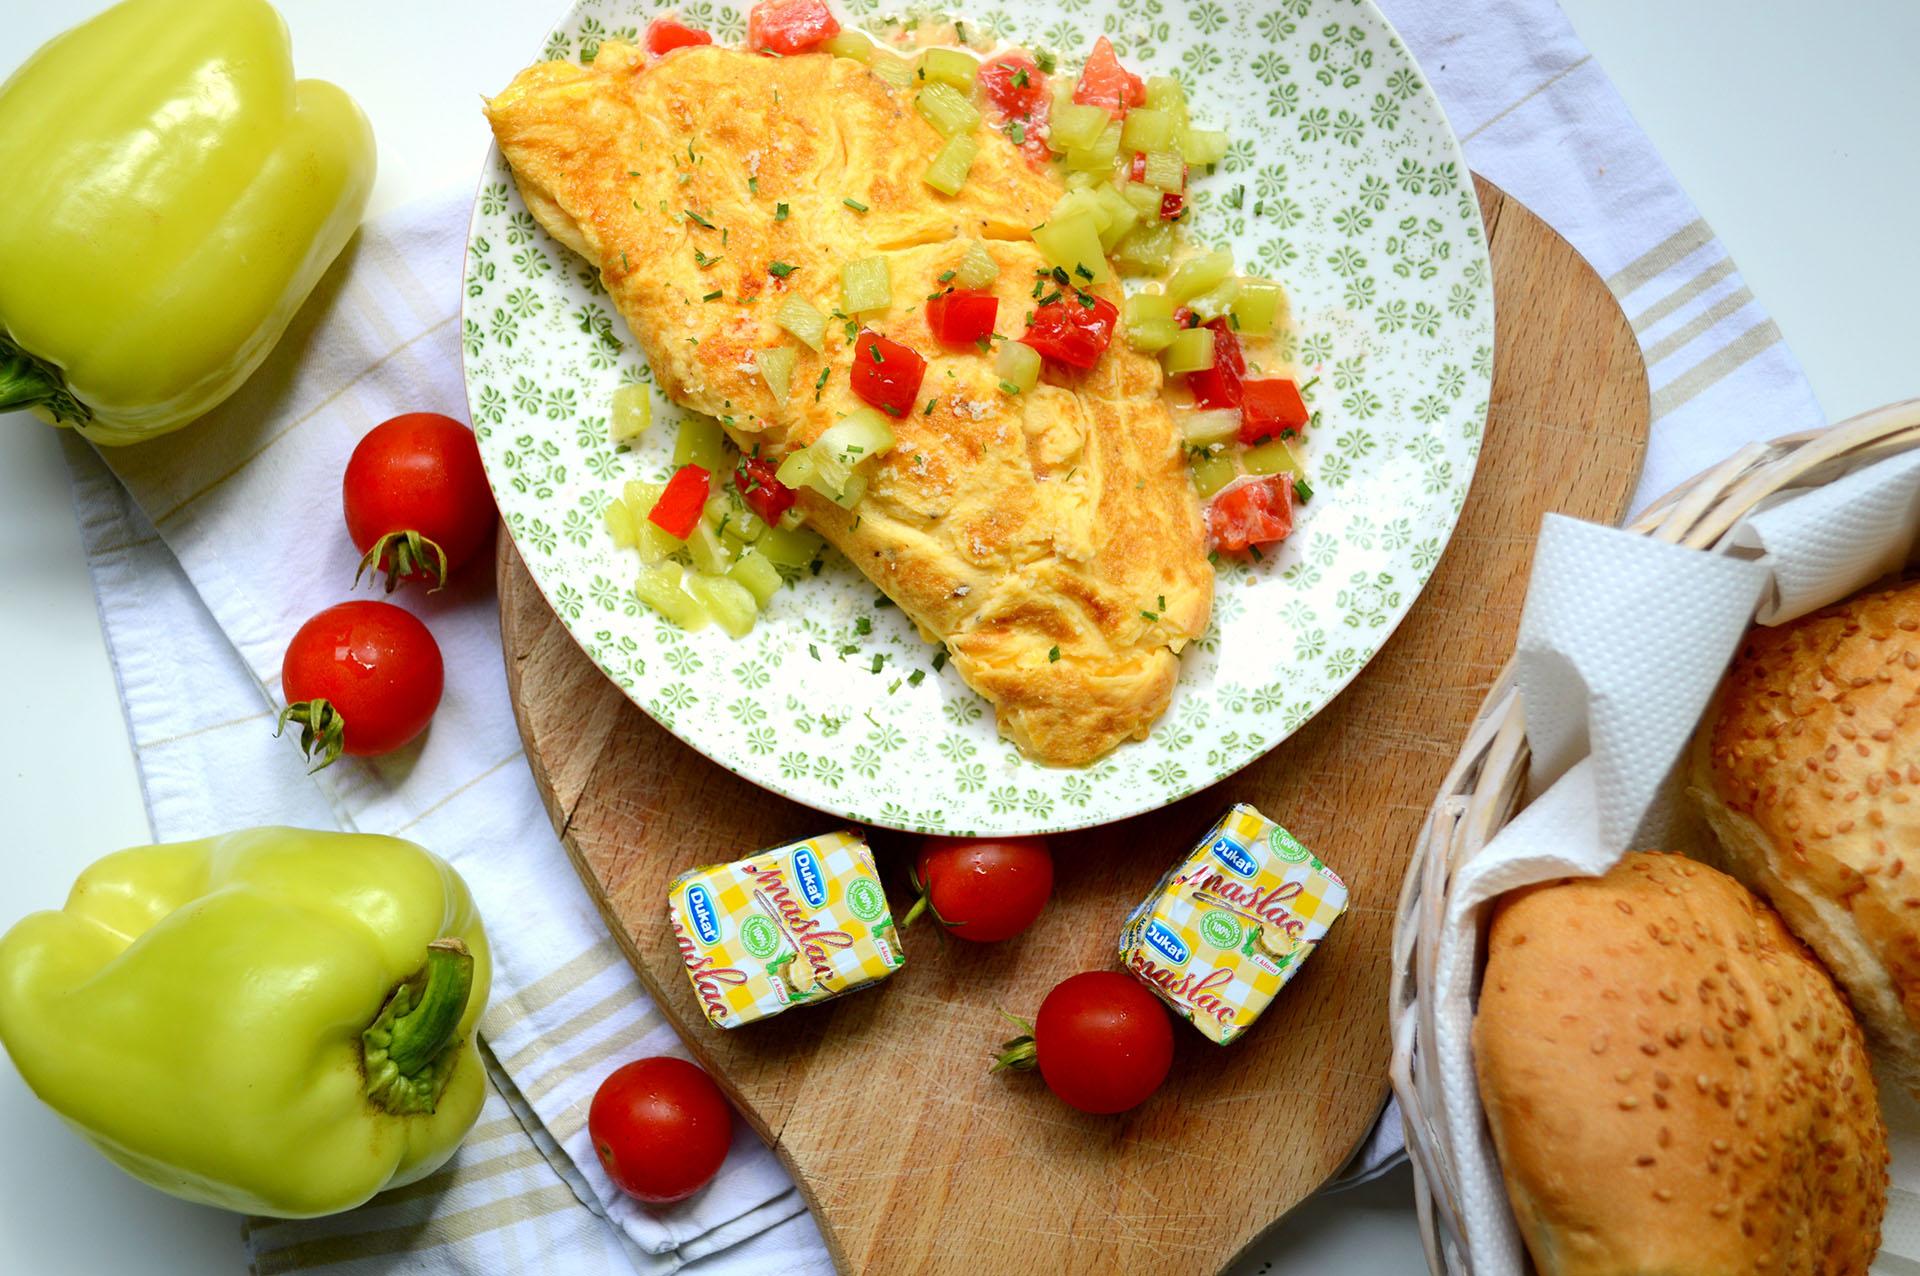 Studentski recepti: Omlet s povrćem i sirom